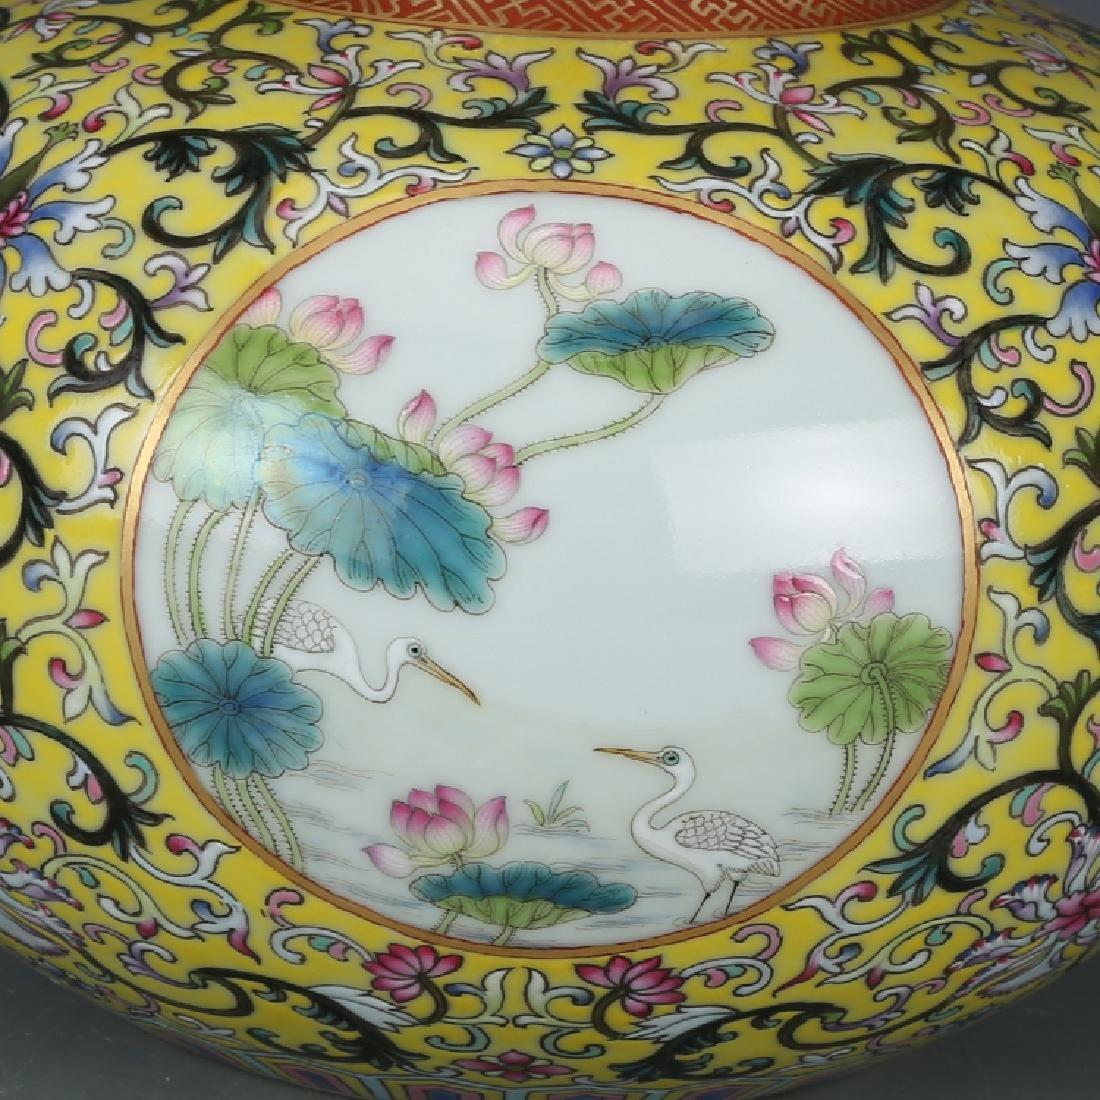 Chinese Famille Rose Porcelain Vase - 4